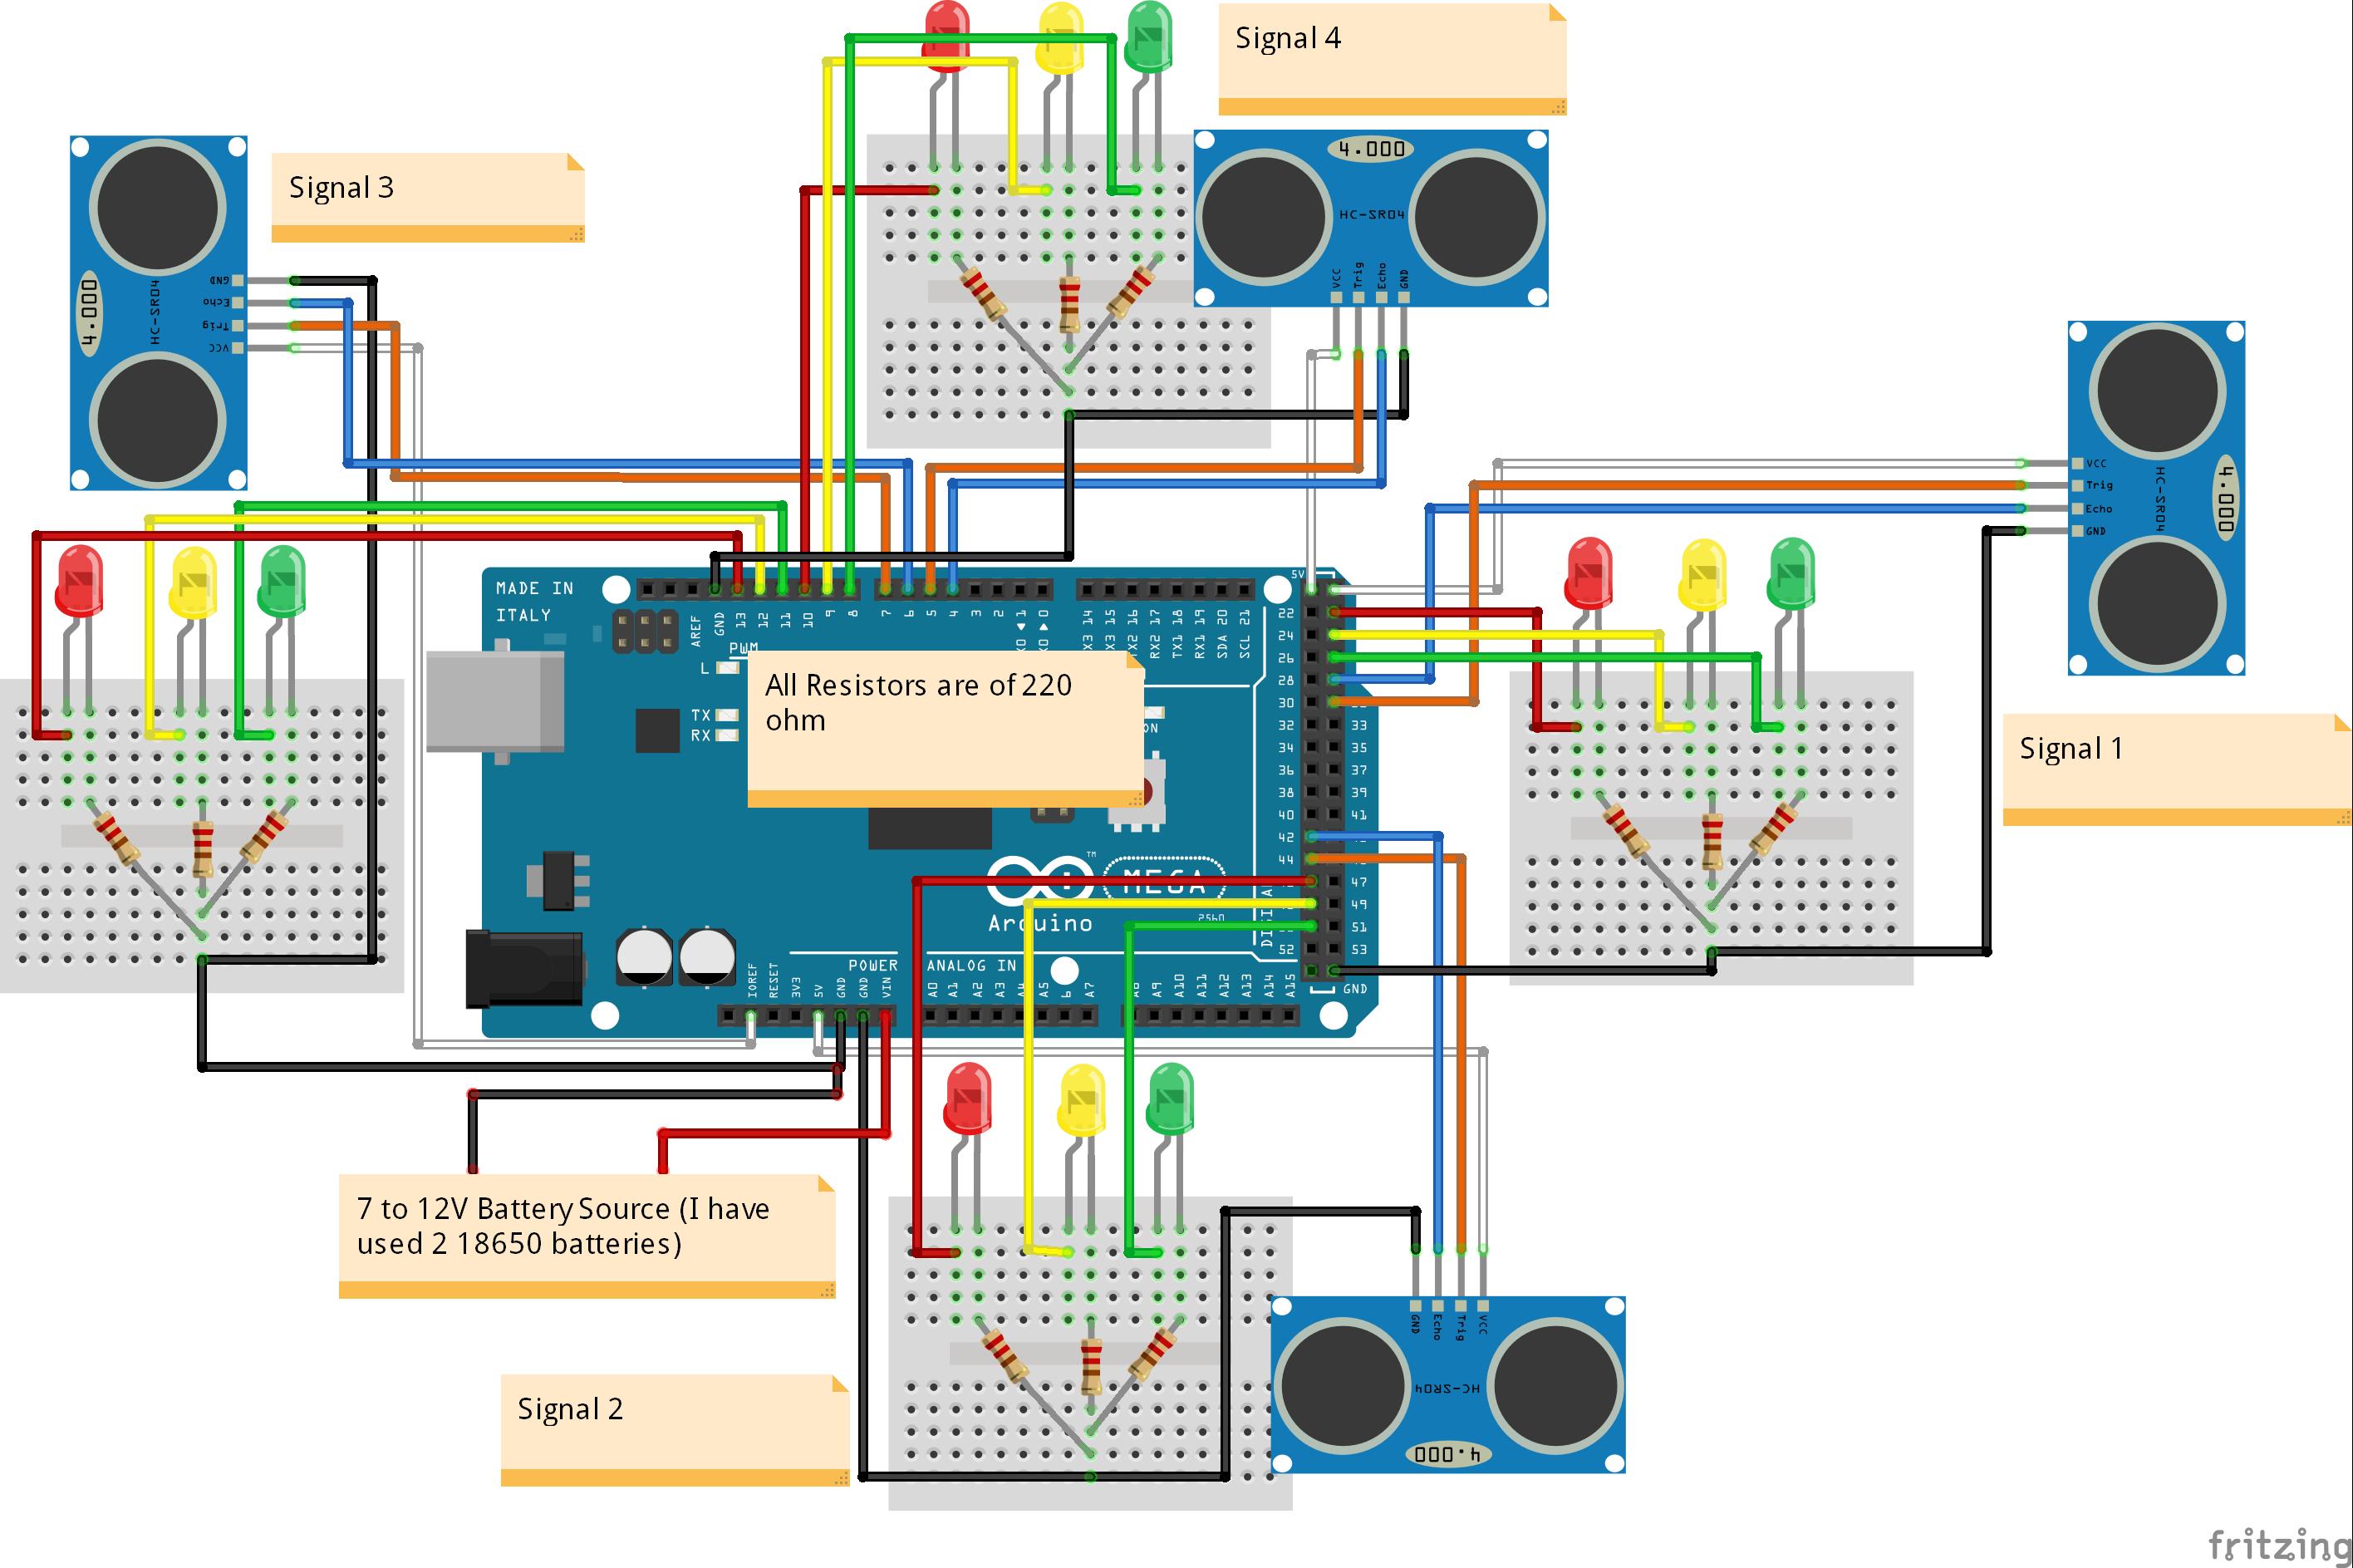 Traffic Signal Stop Light Wiring With Arduino Controller 6 - Schema